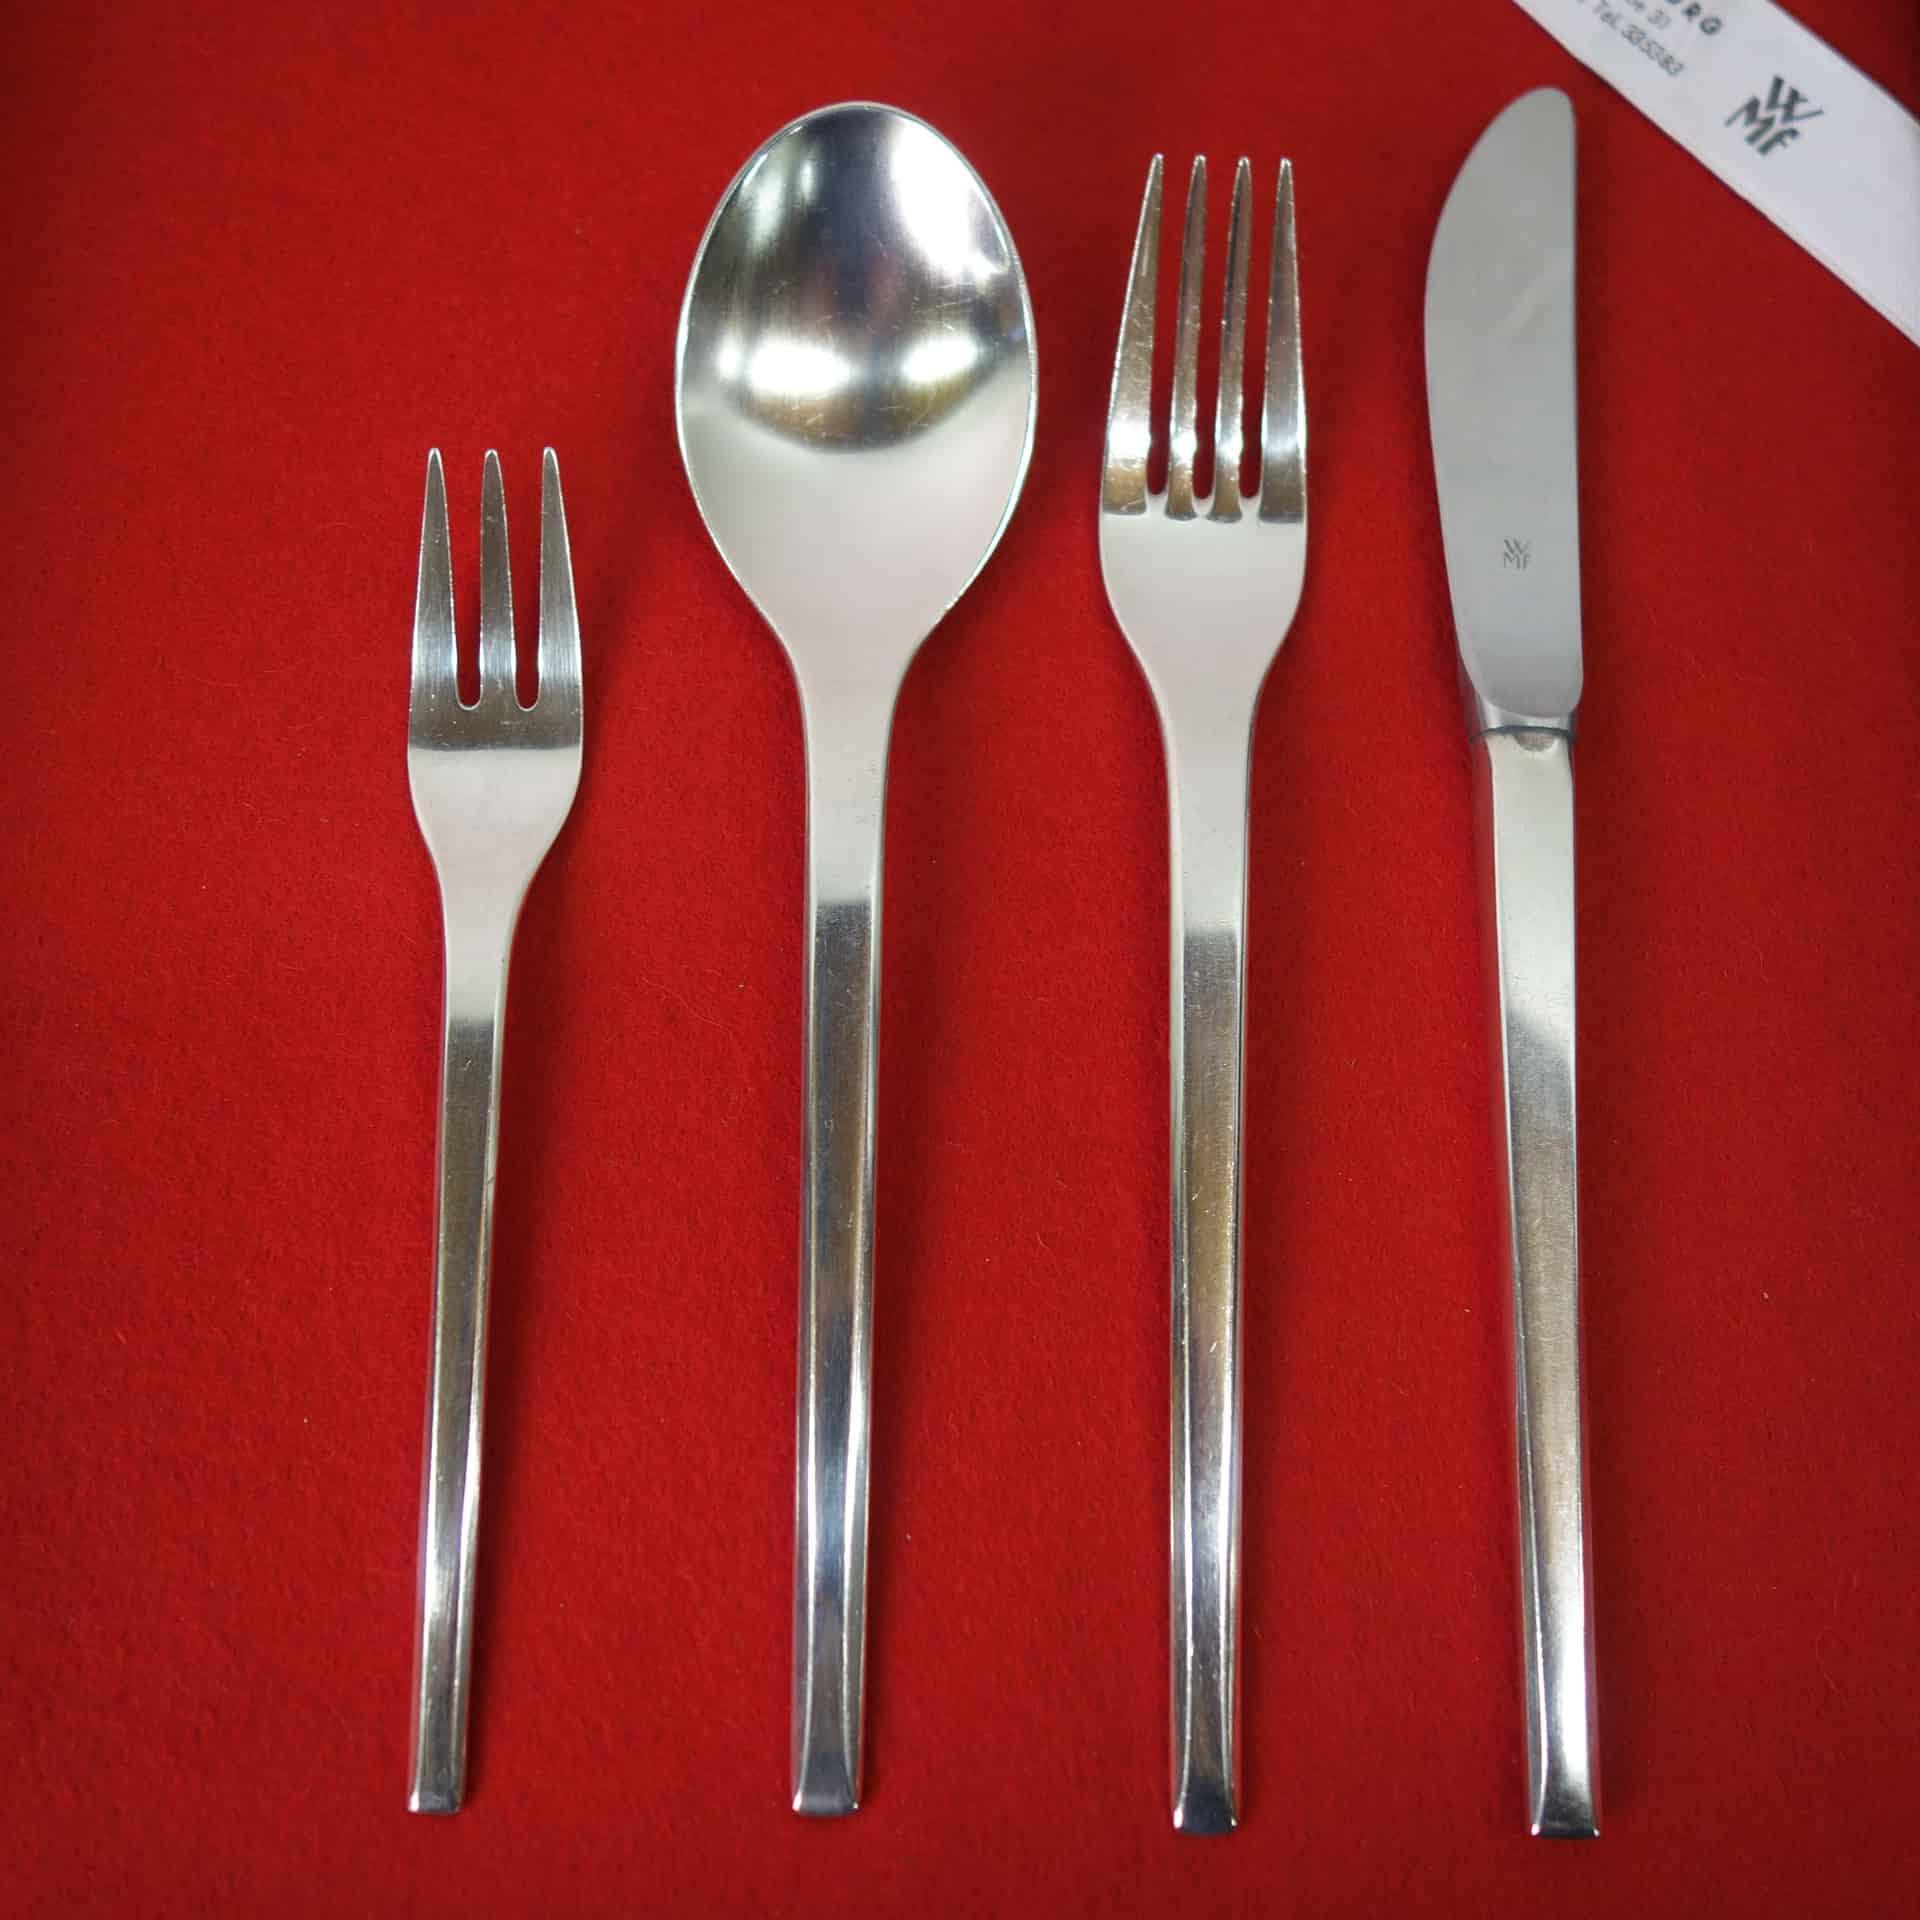 set of modernist cutlery by wmf germany mark parrish mid century modern. Black Bedroom Furniture Sets. Home Design Ideas